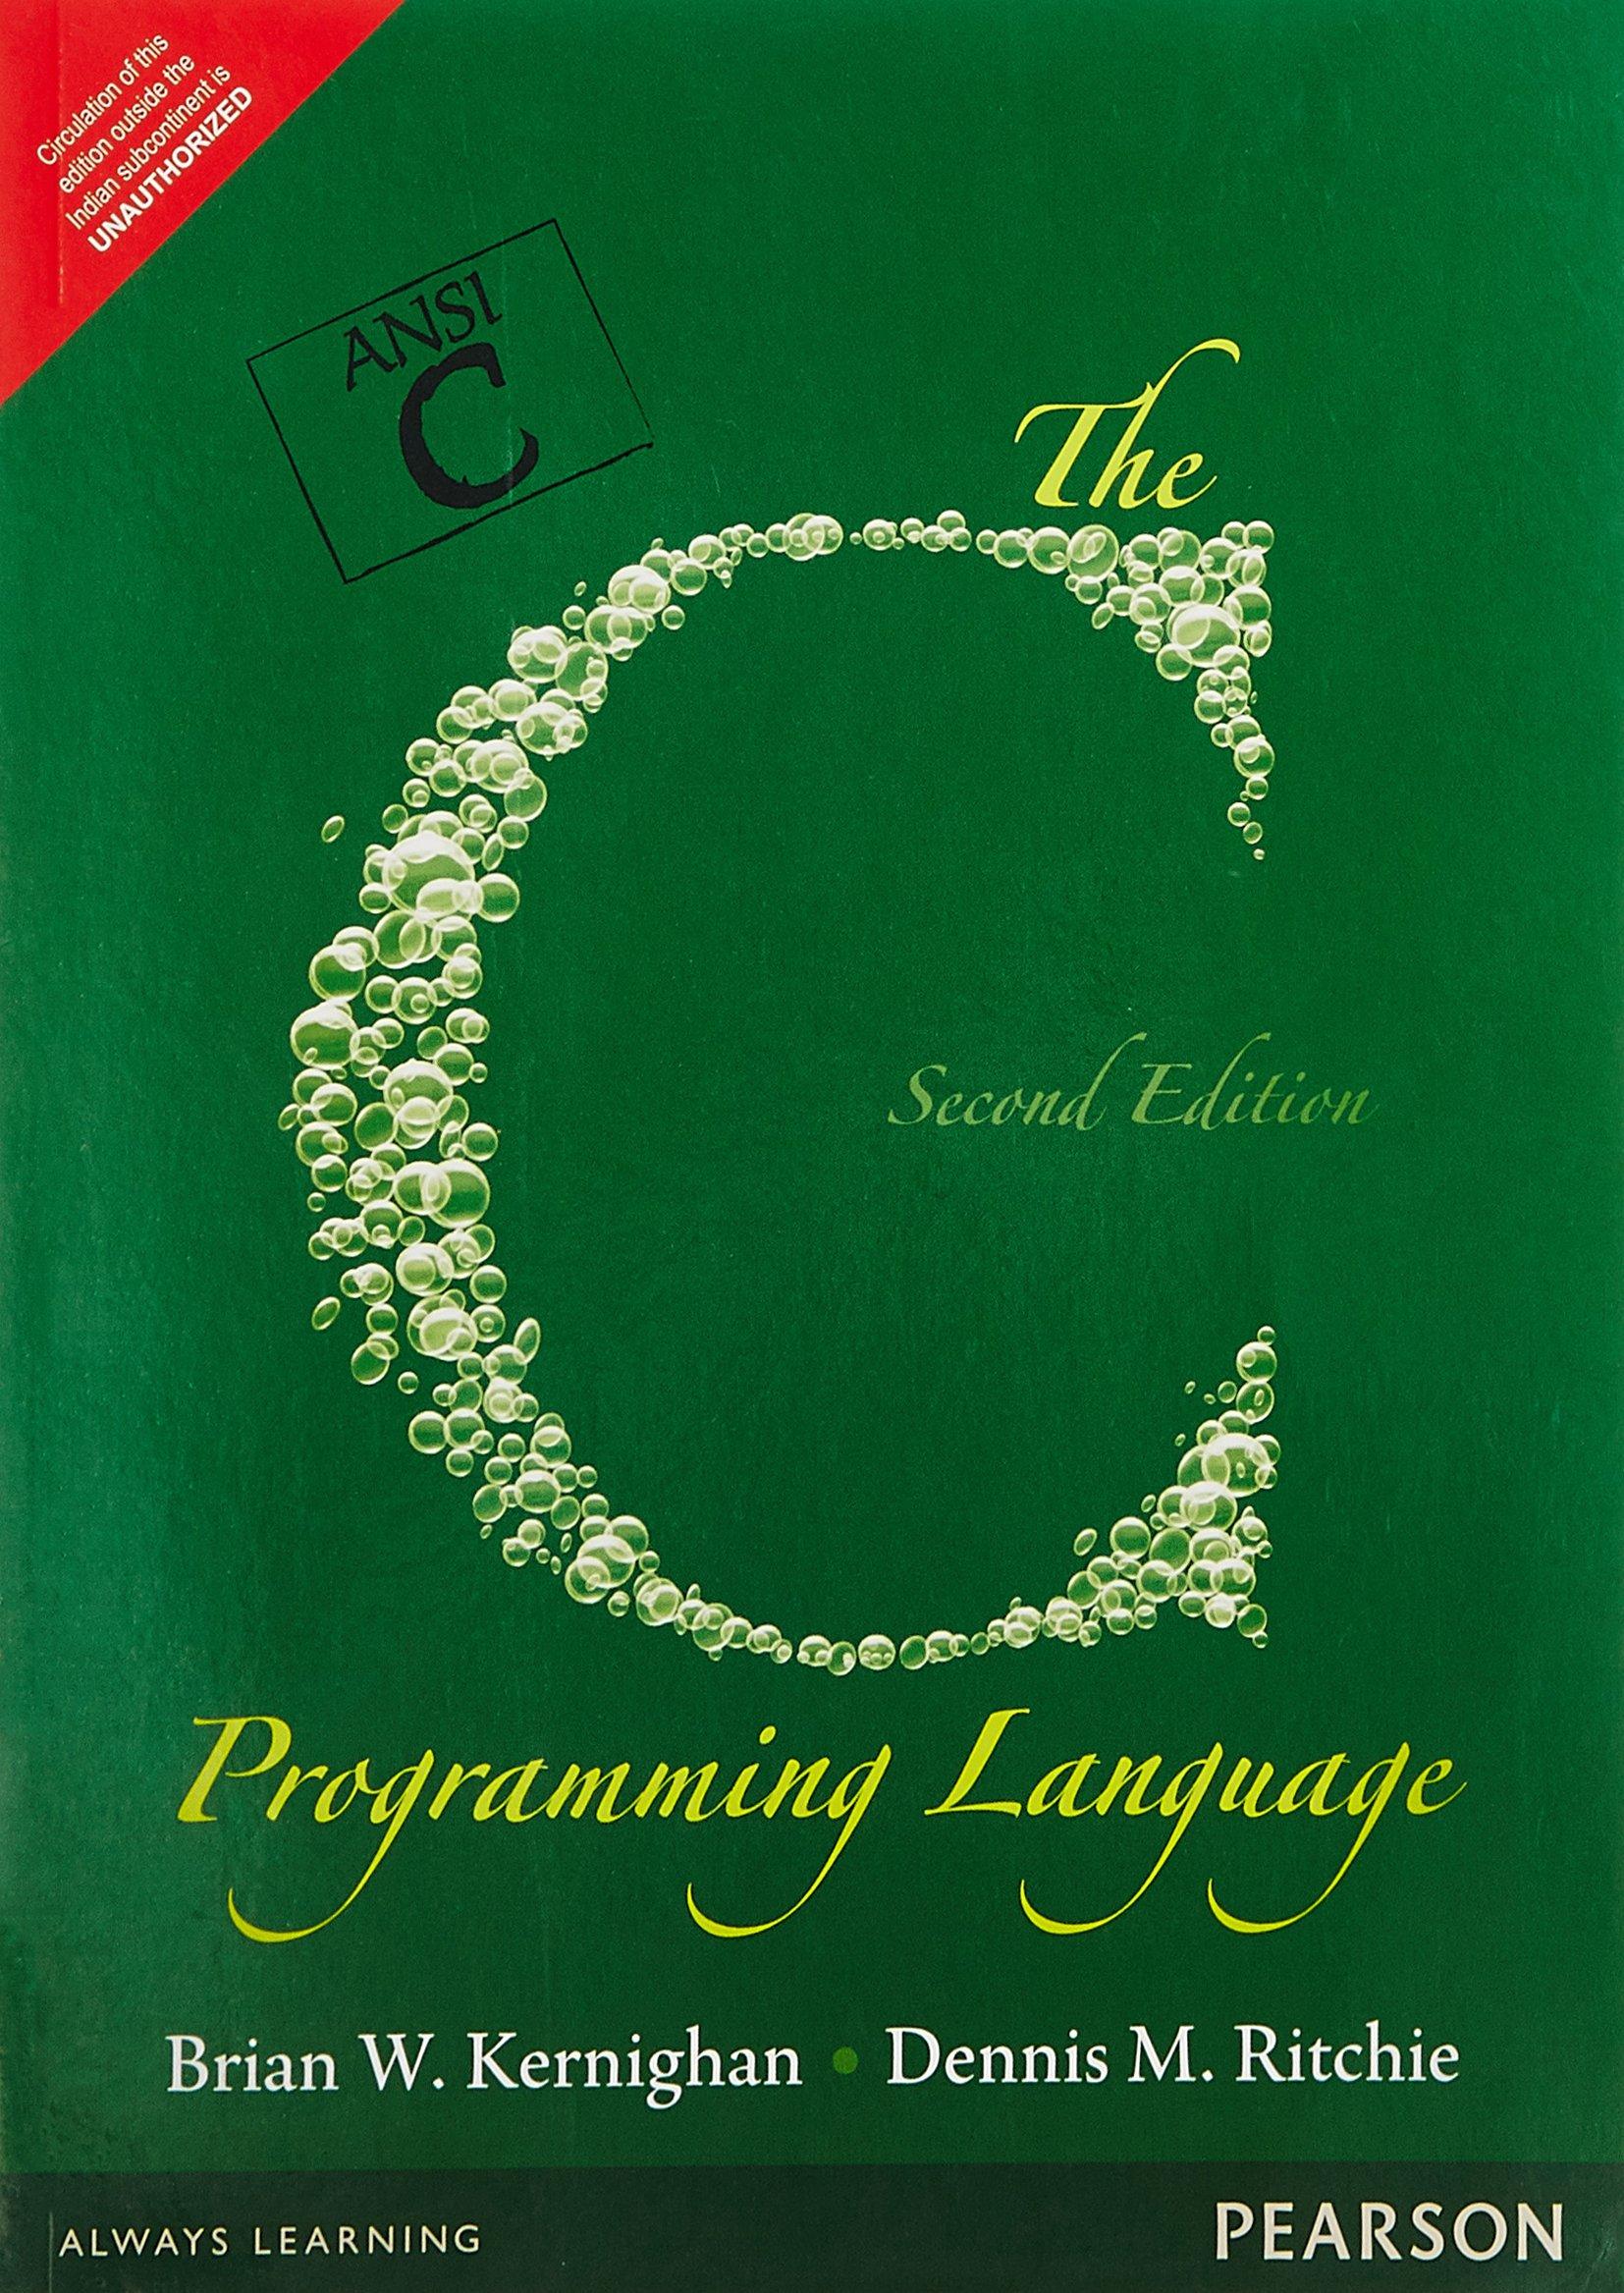 Balaguruswamy pdf c language